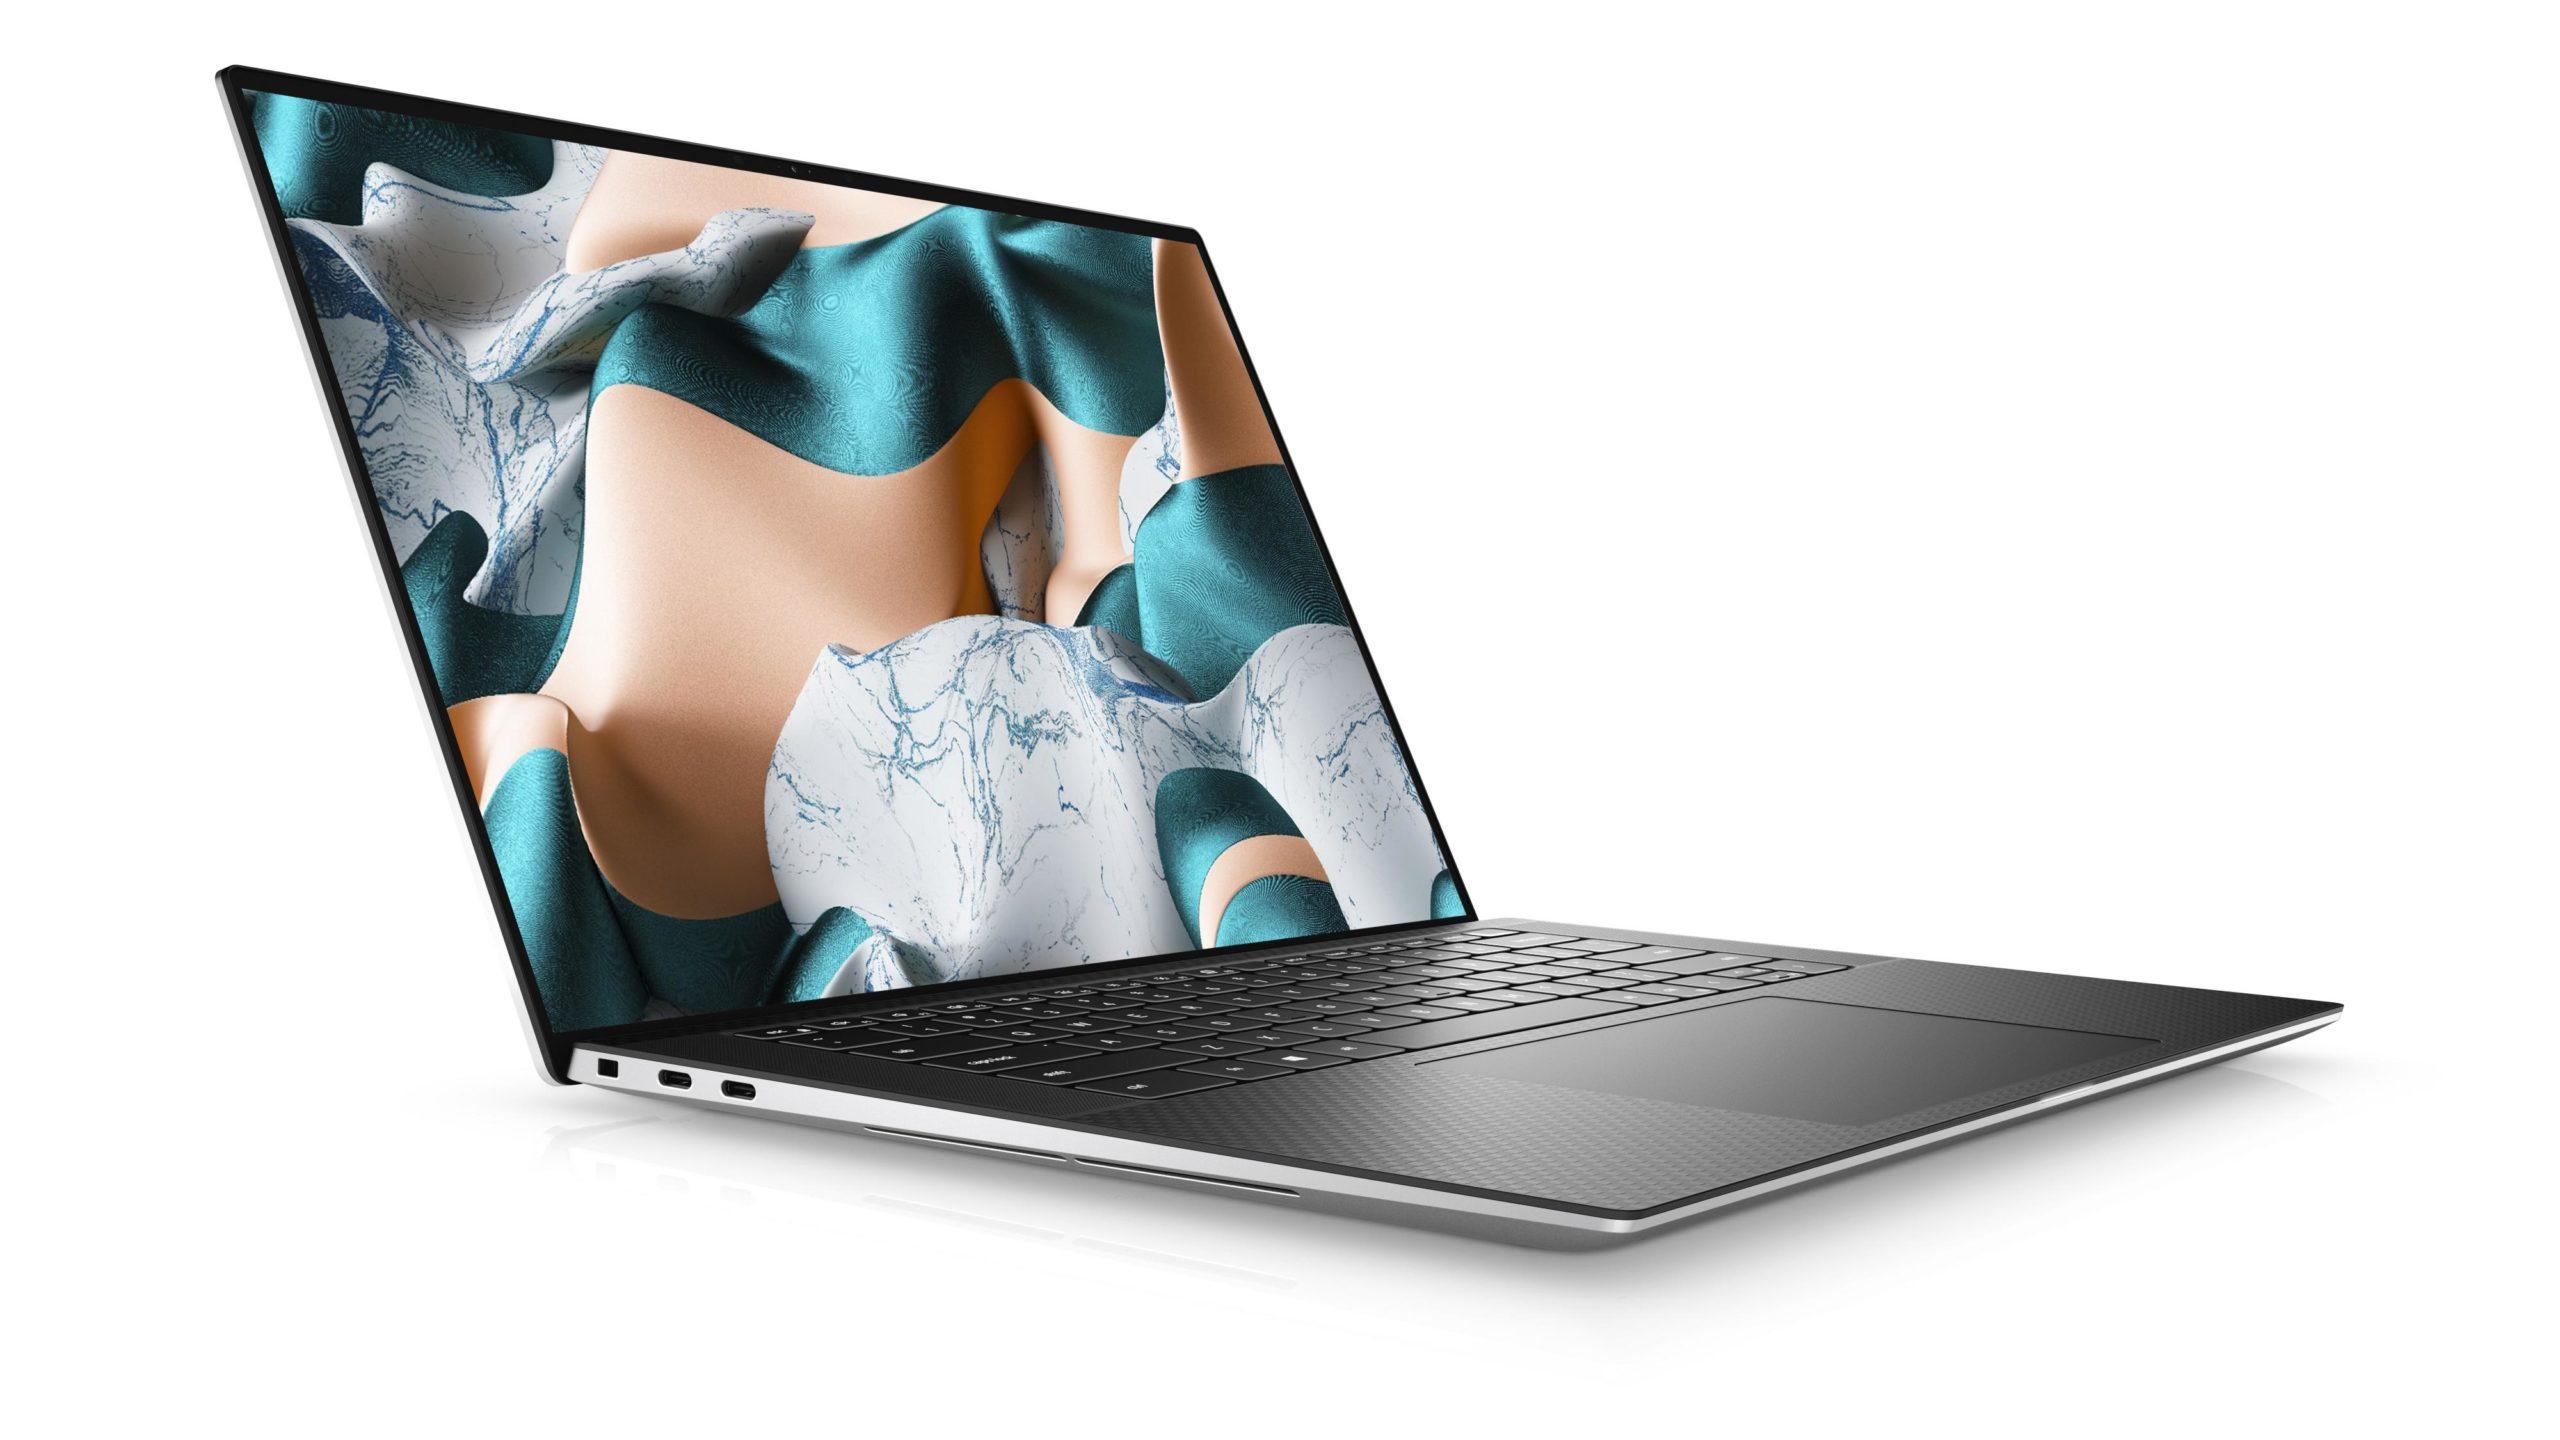 Dell XPS 15: best 15-inch laptop